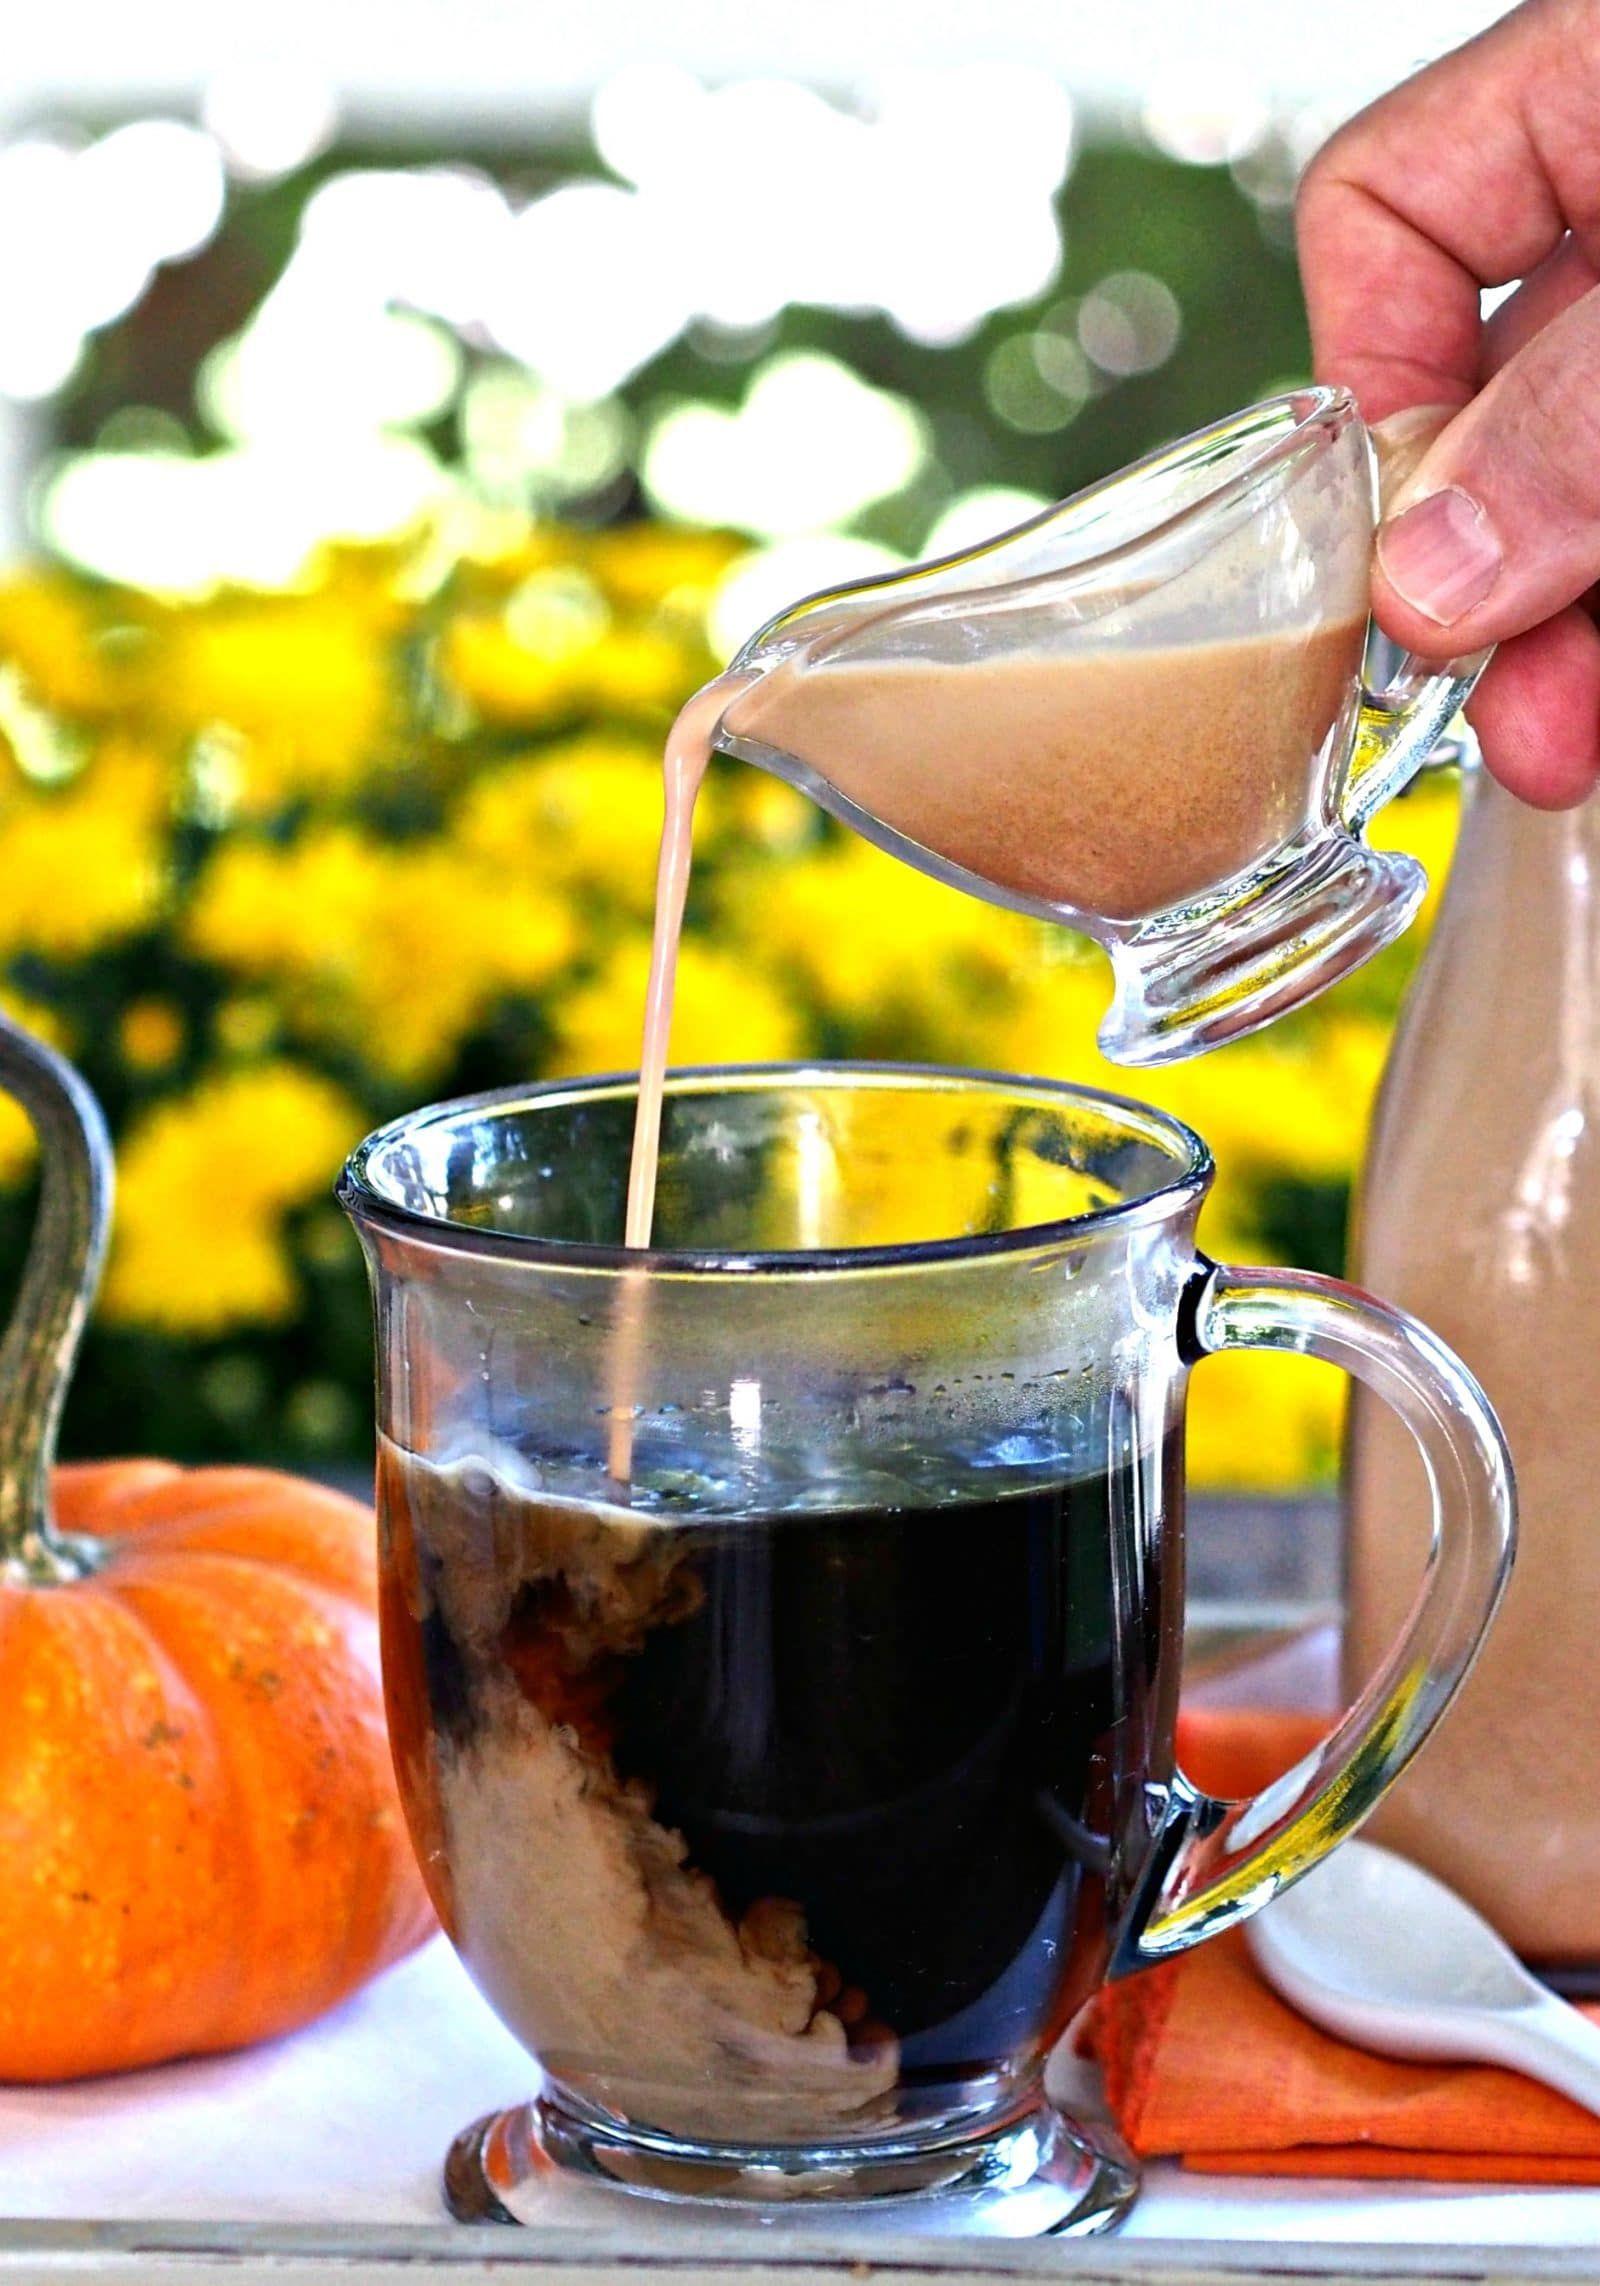 Homemade coffee creamerless expensive healthier